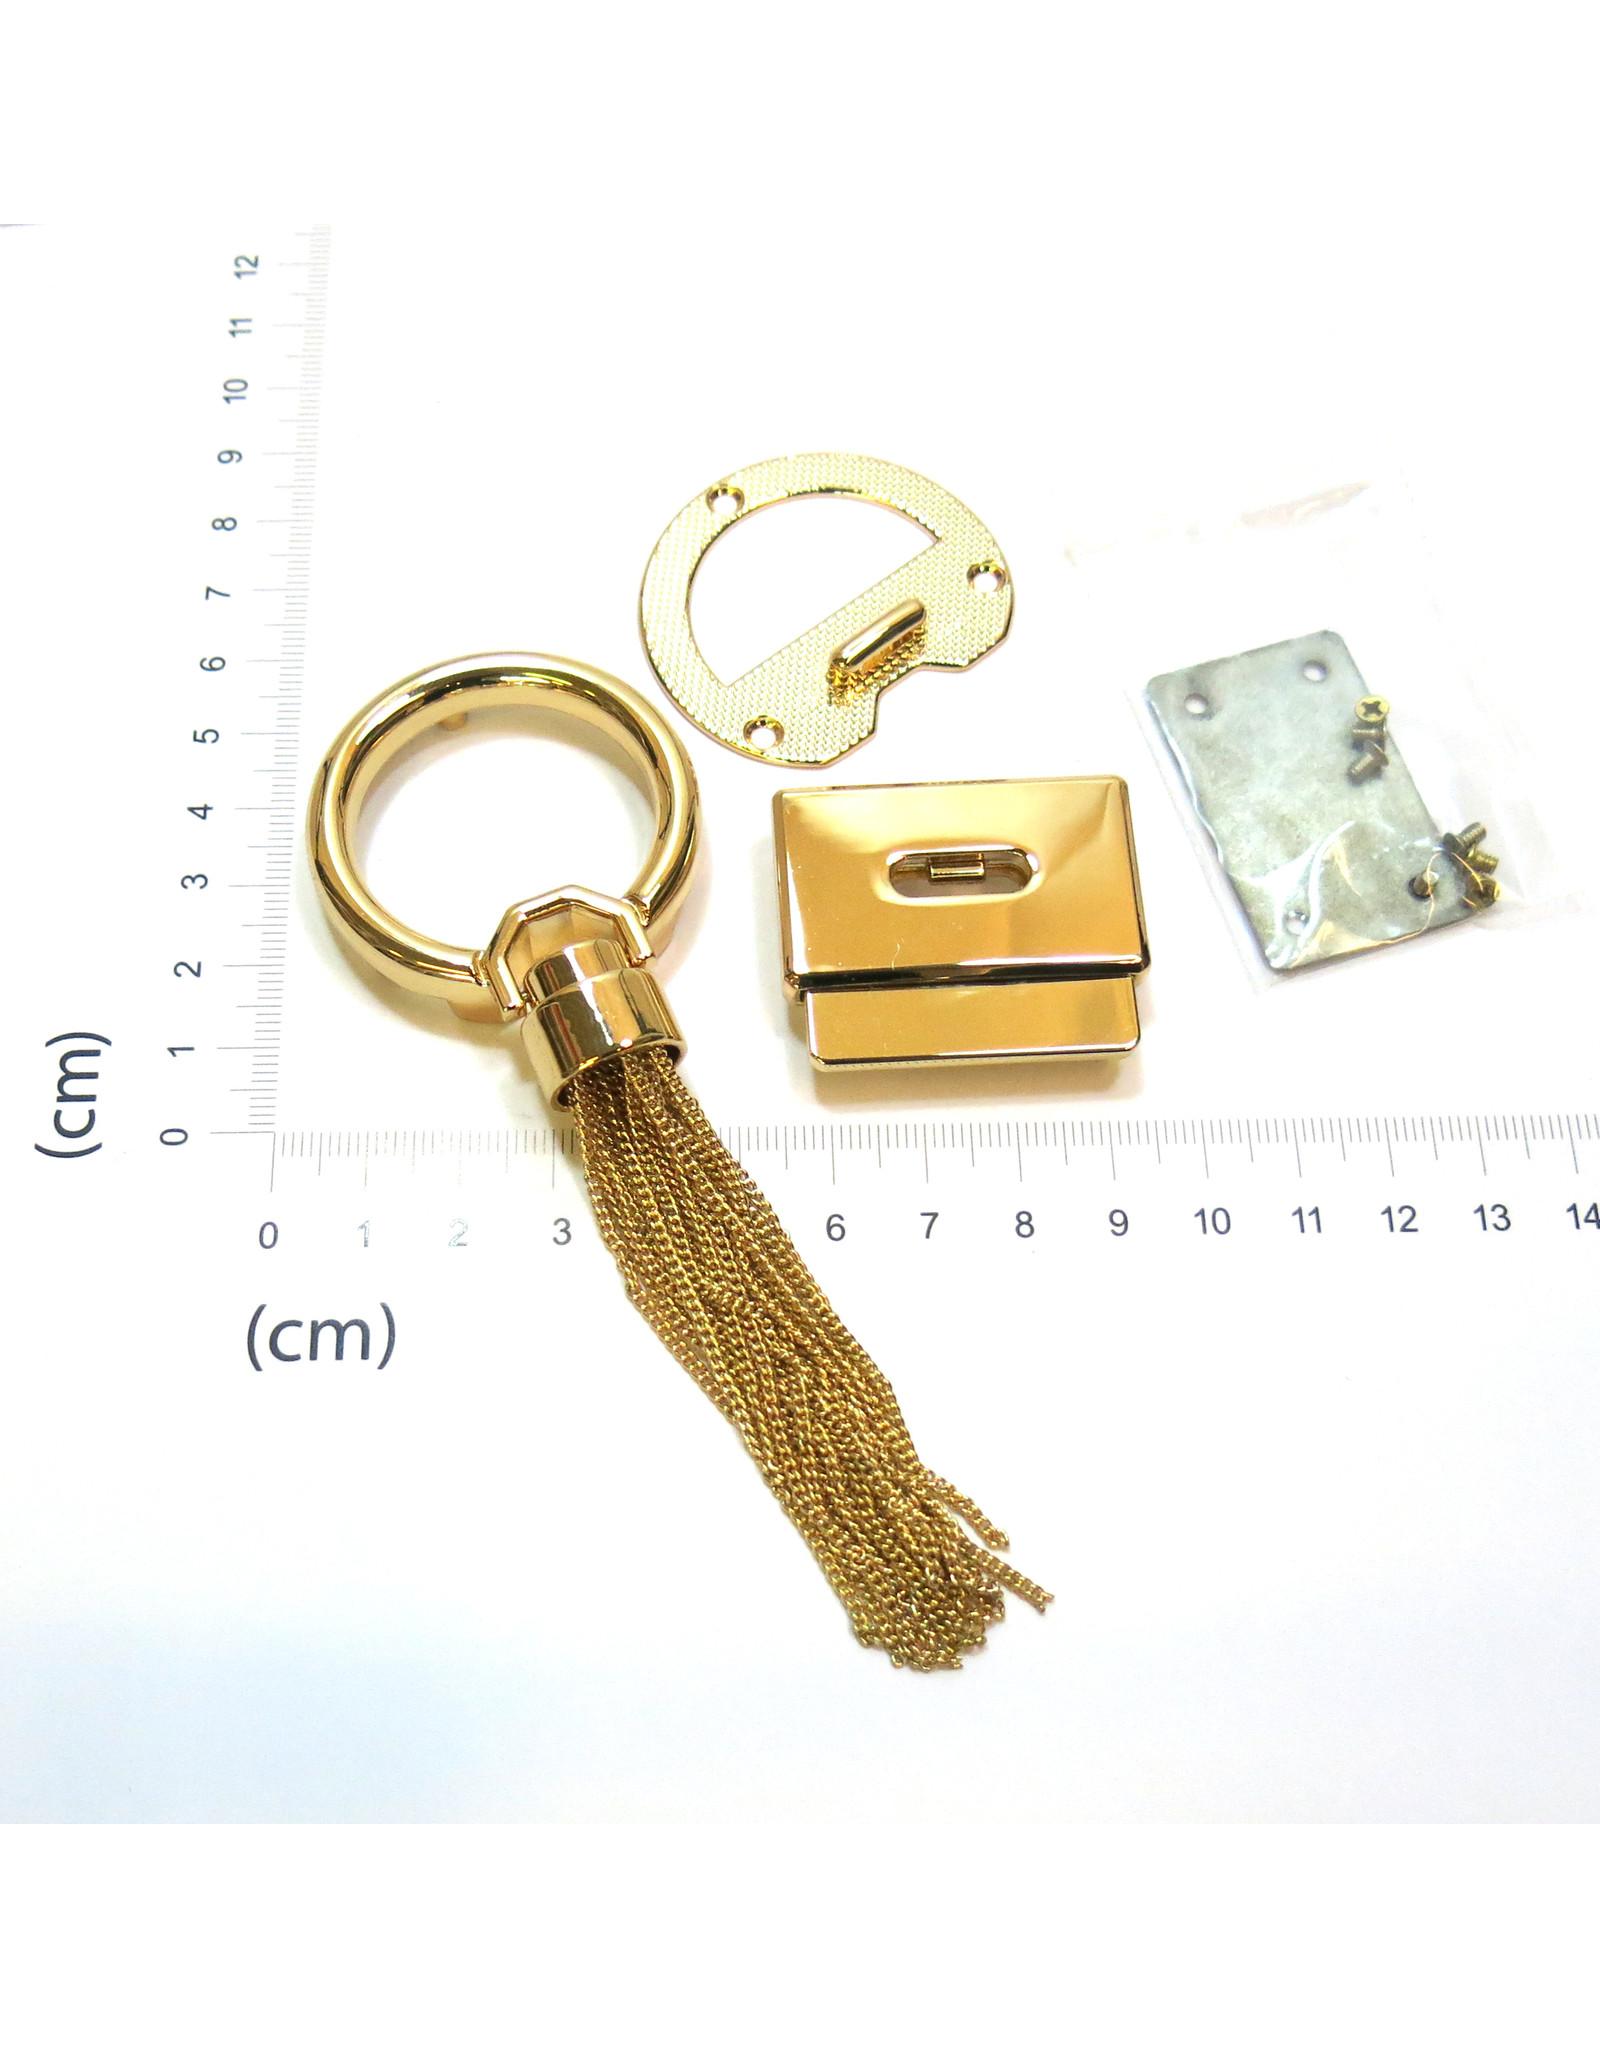 Purse/bag lock with metal tassel